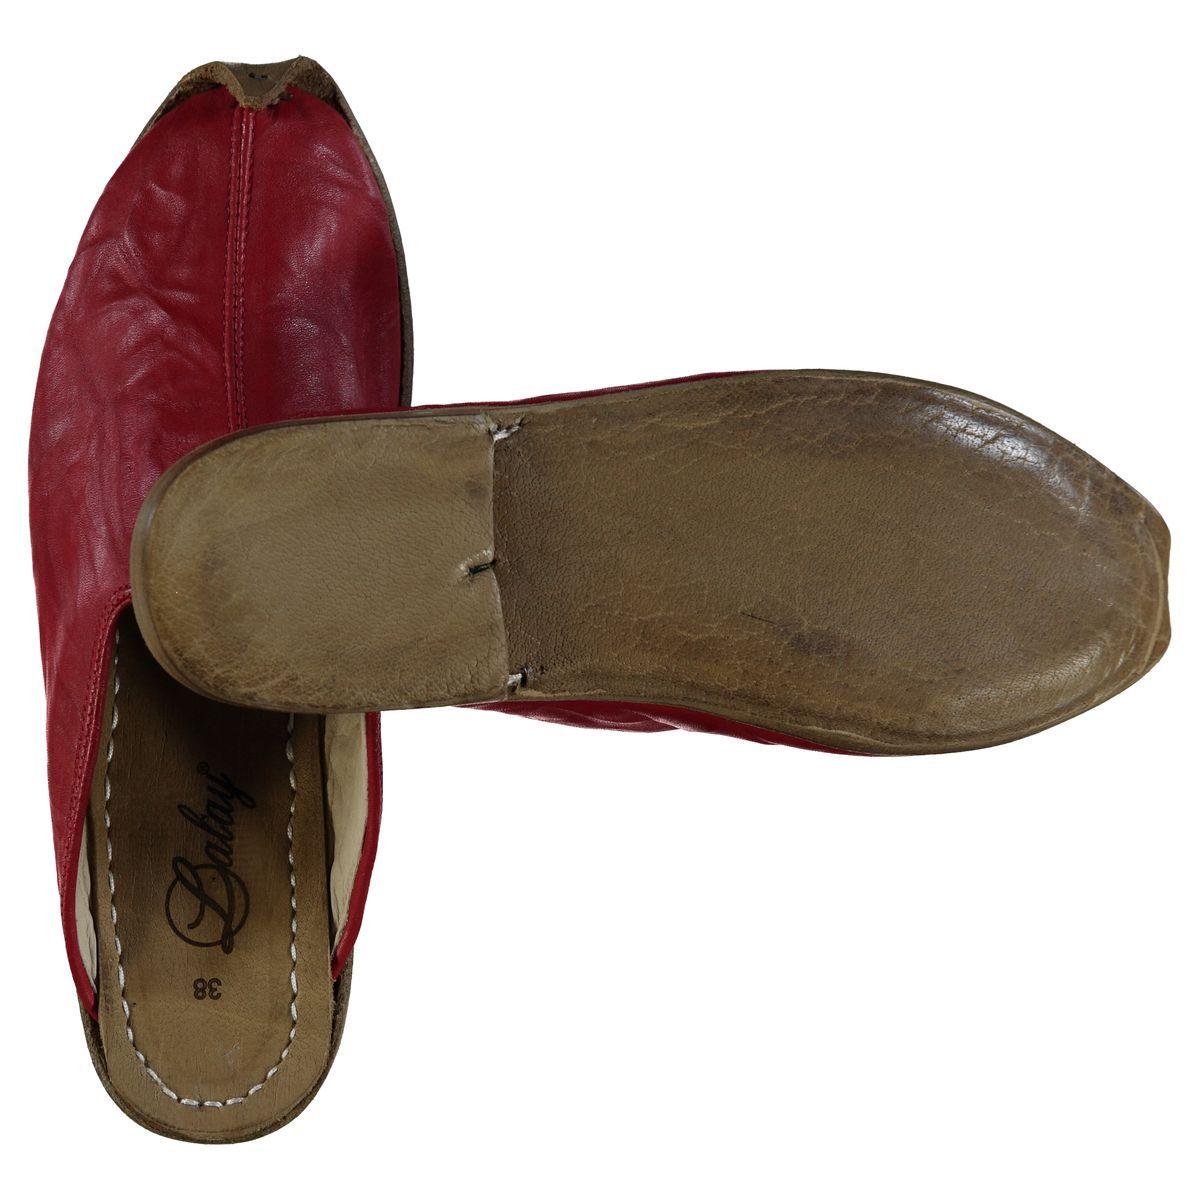 Slipper - Babouche - Leather / Handmade - Red